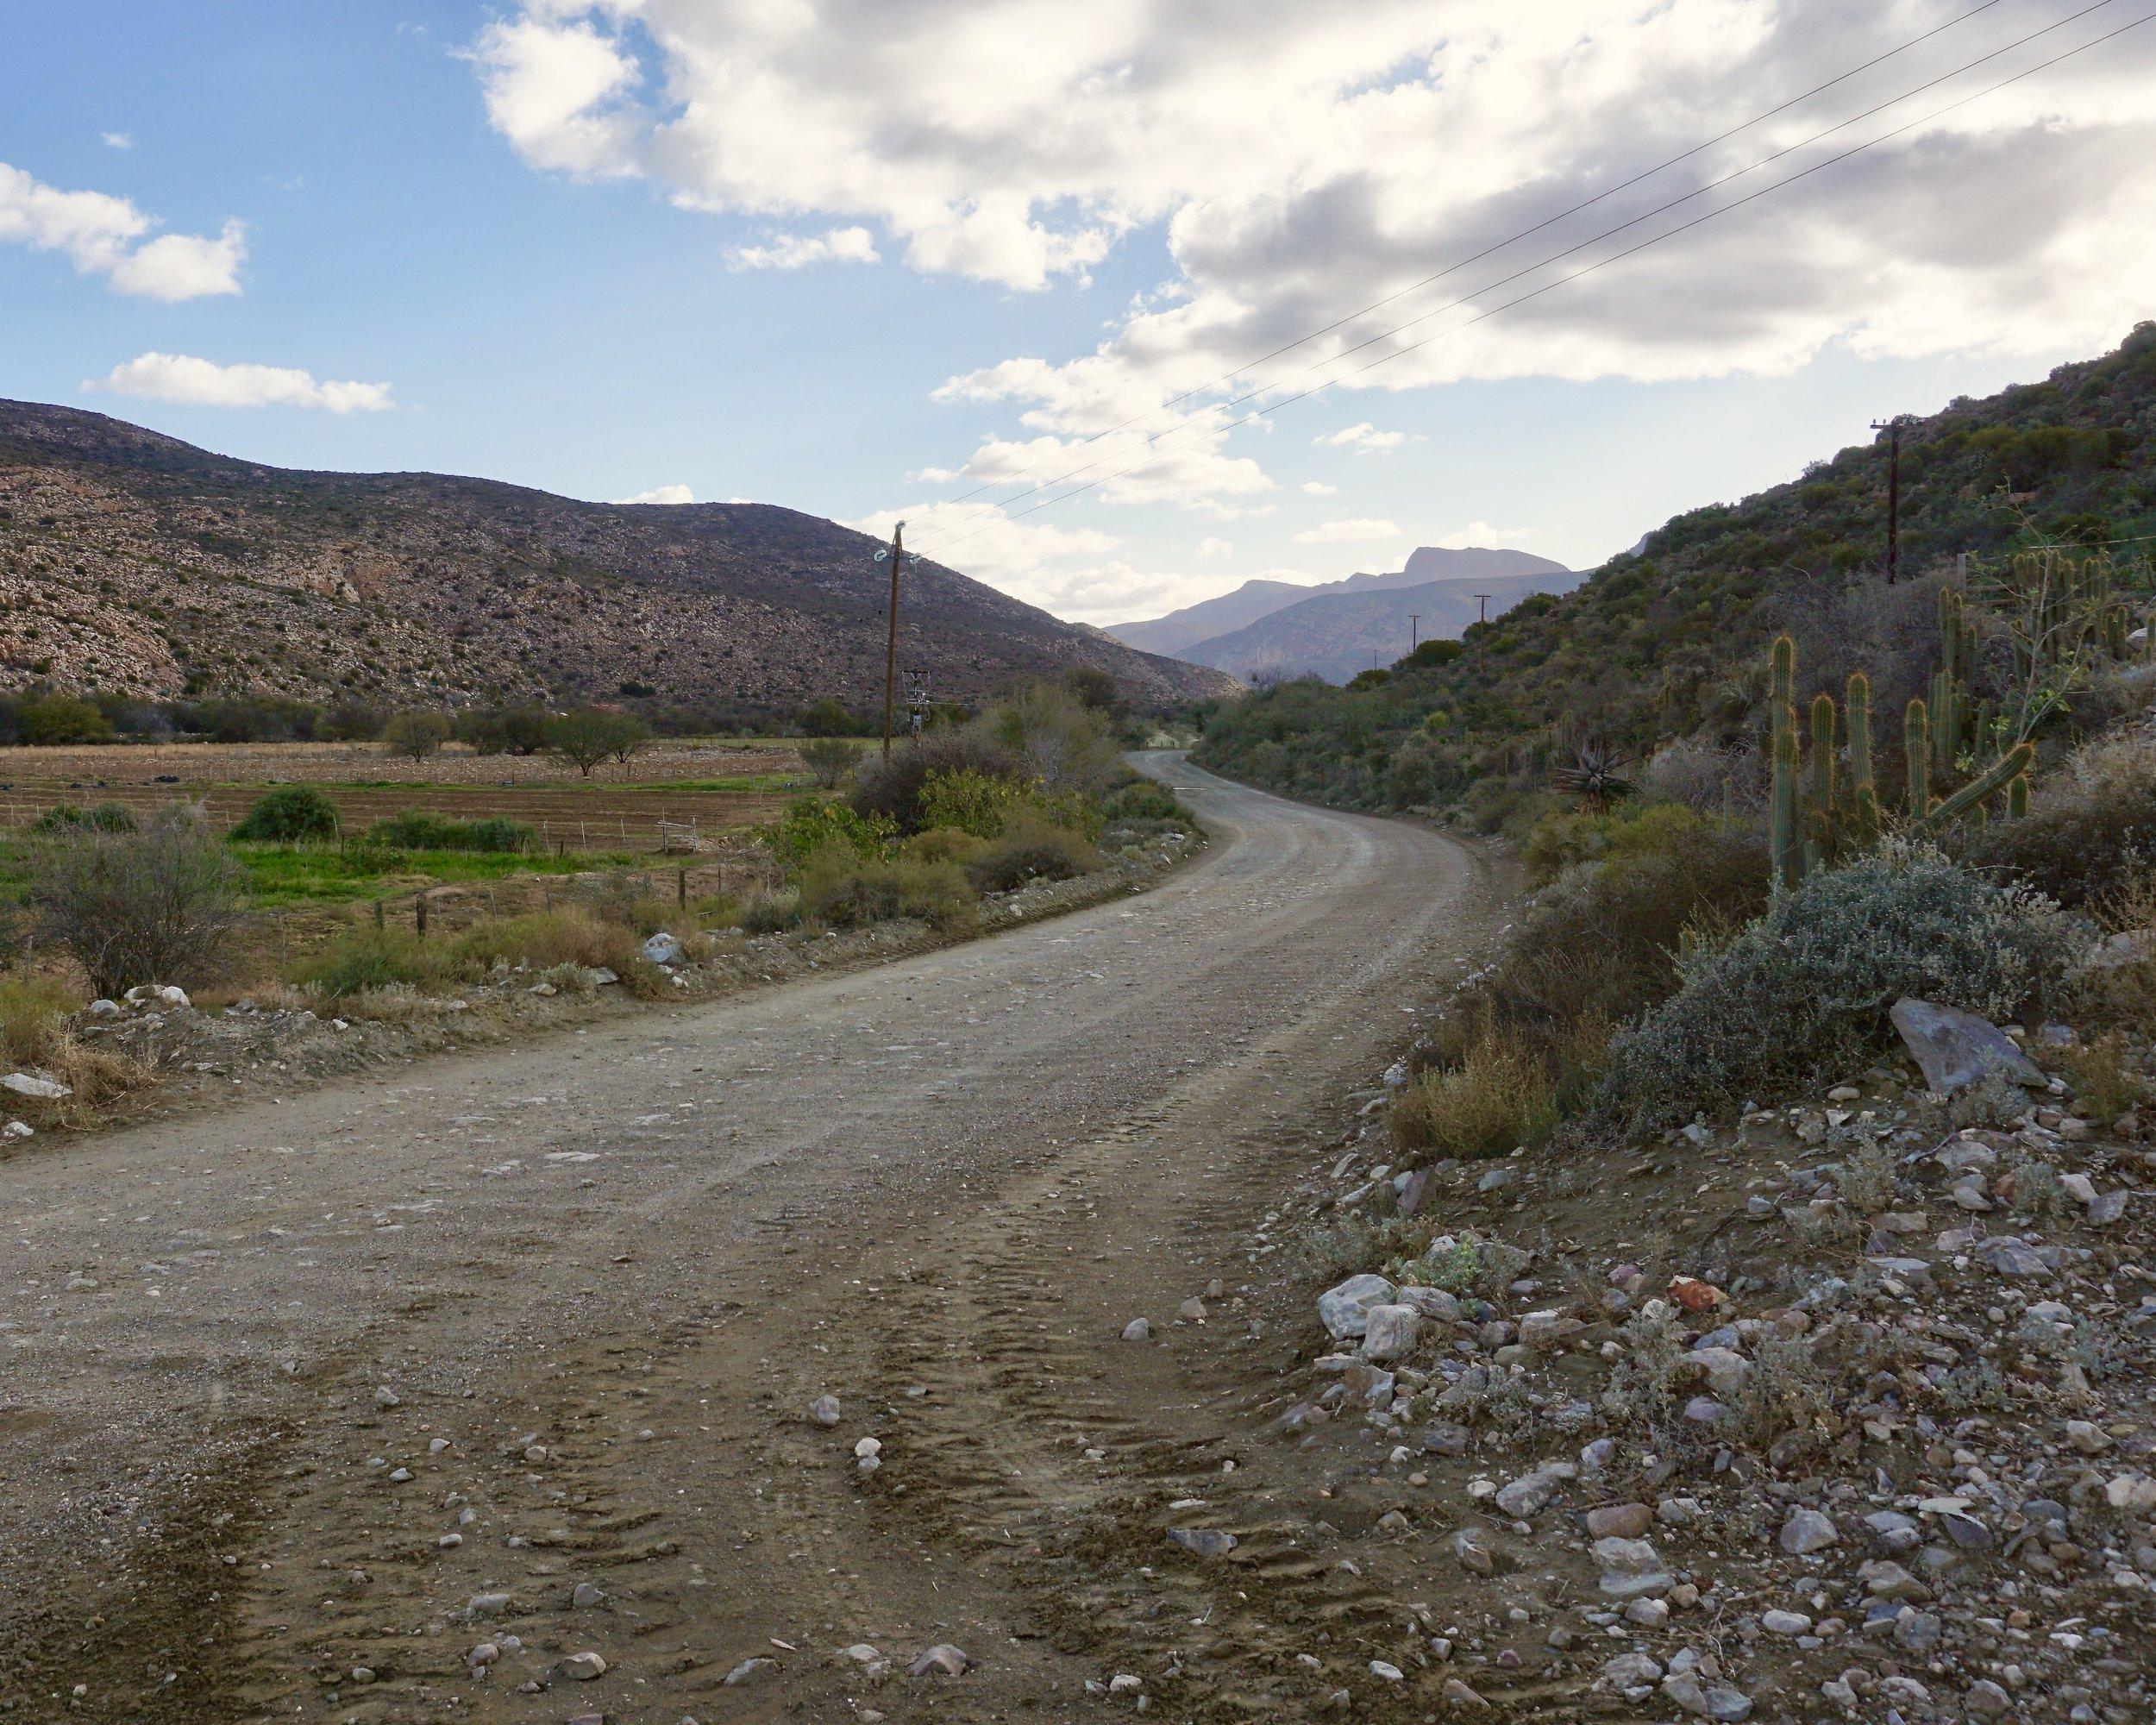 Klein Karoo: Prins River Valley